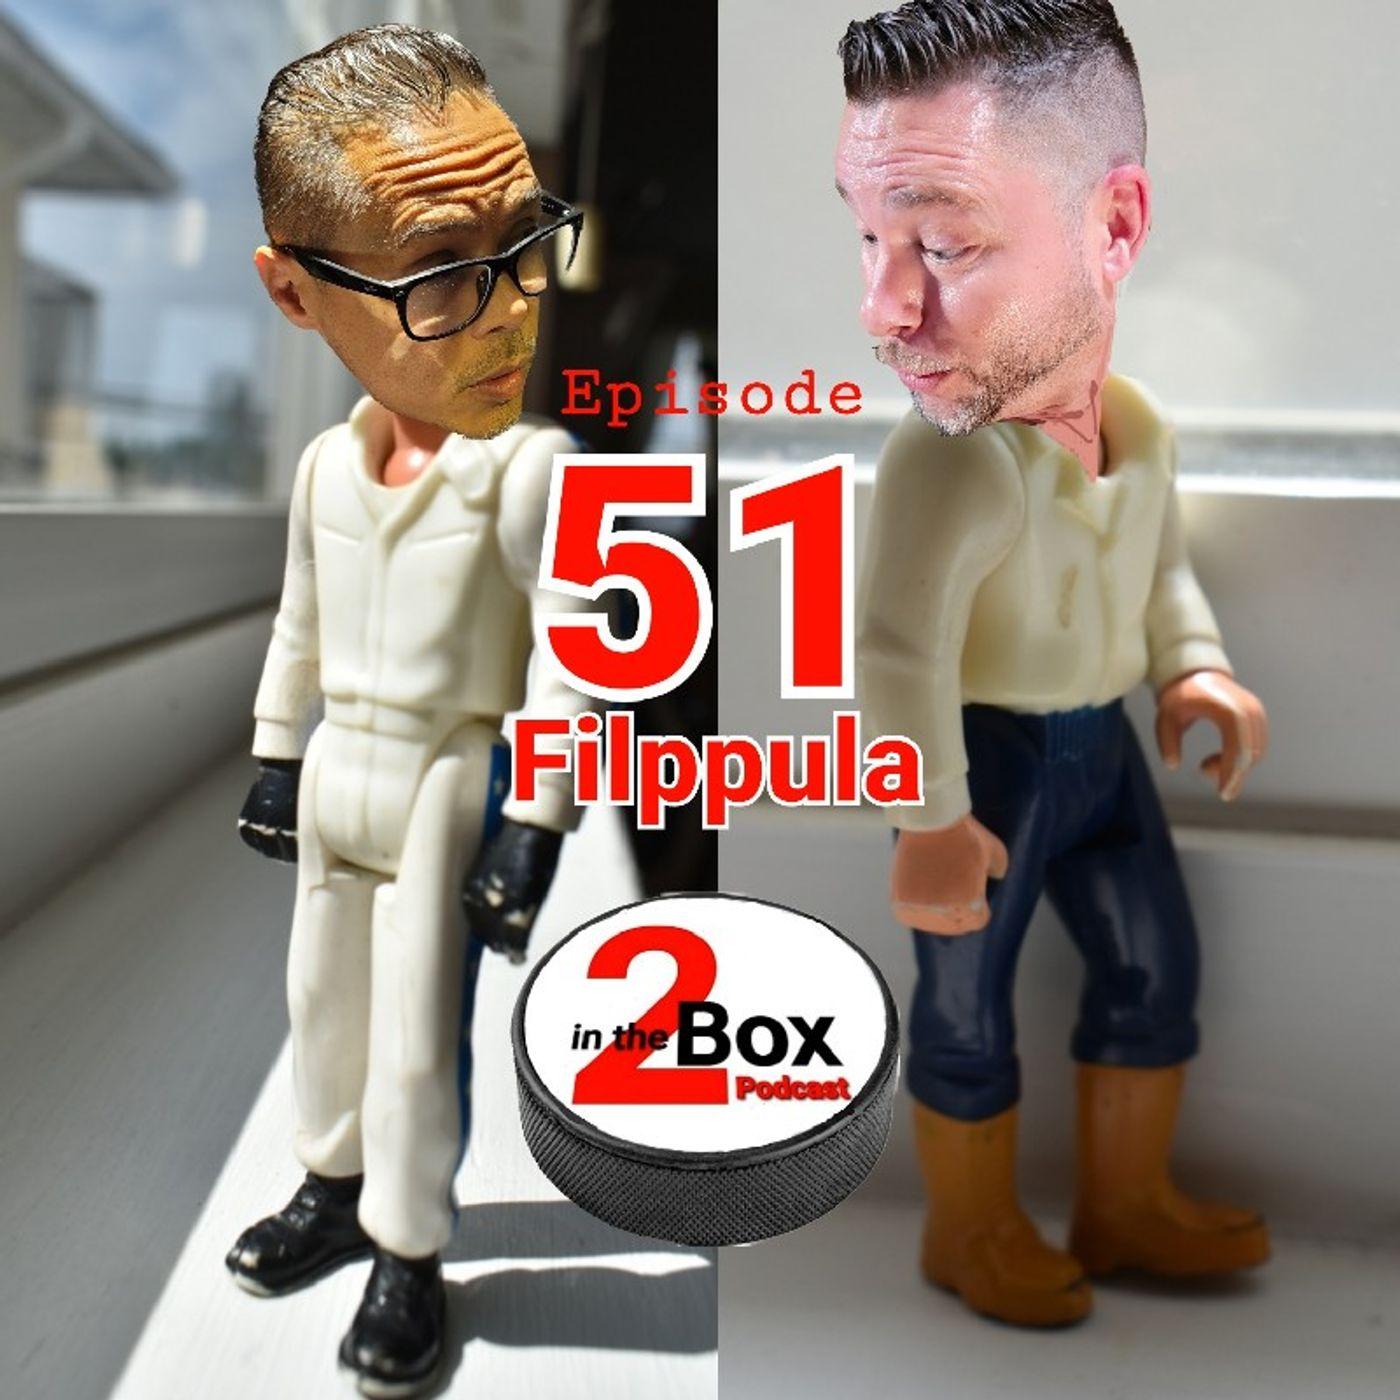 Episode 51 - Filppula